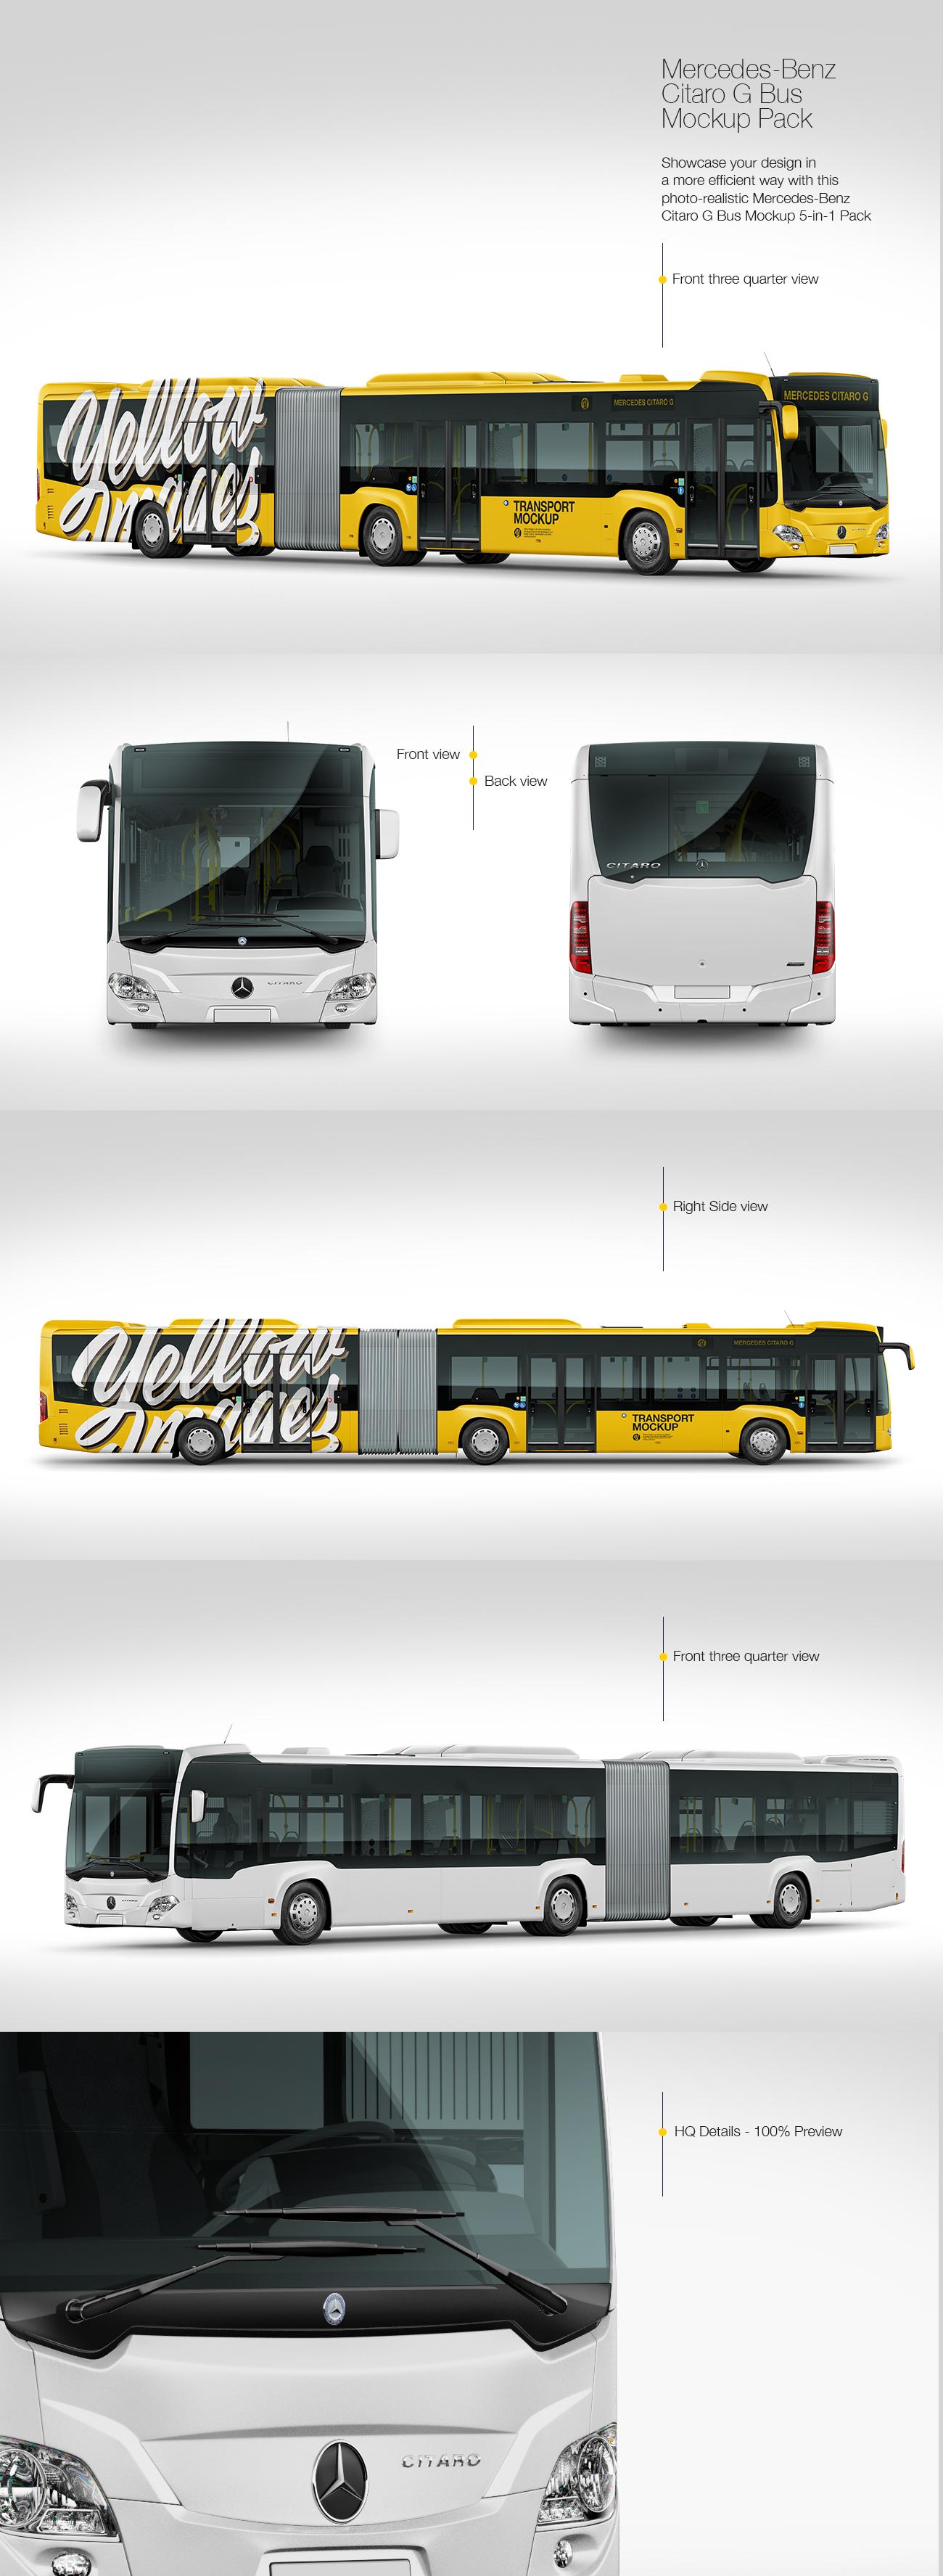 Mercedes-Benz Citaro G Bus Mockup Pack